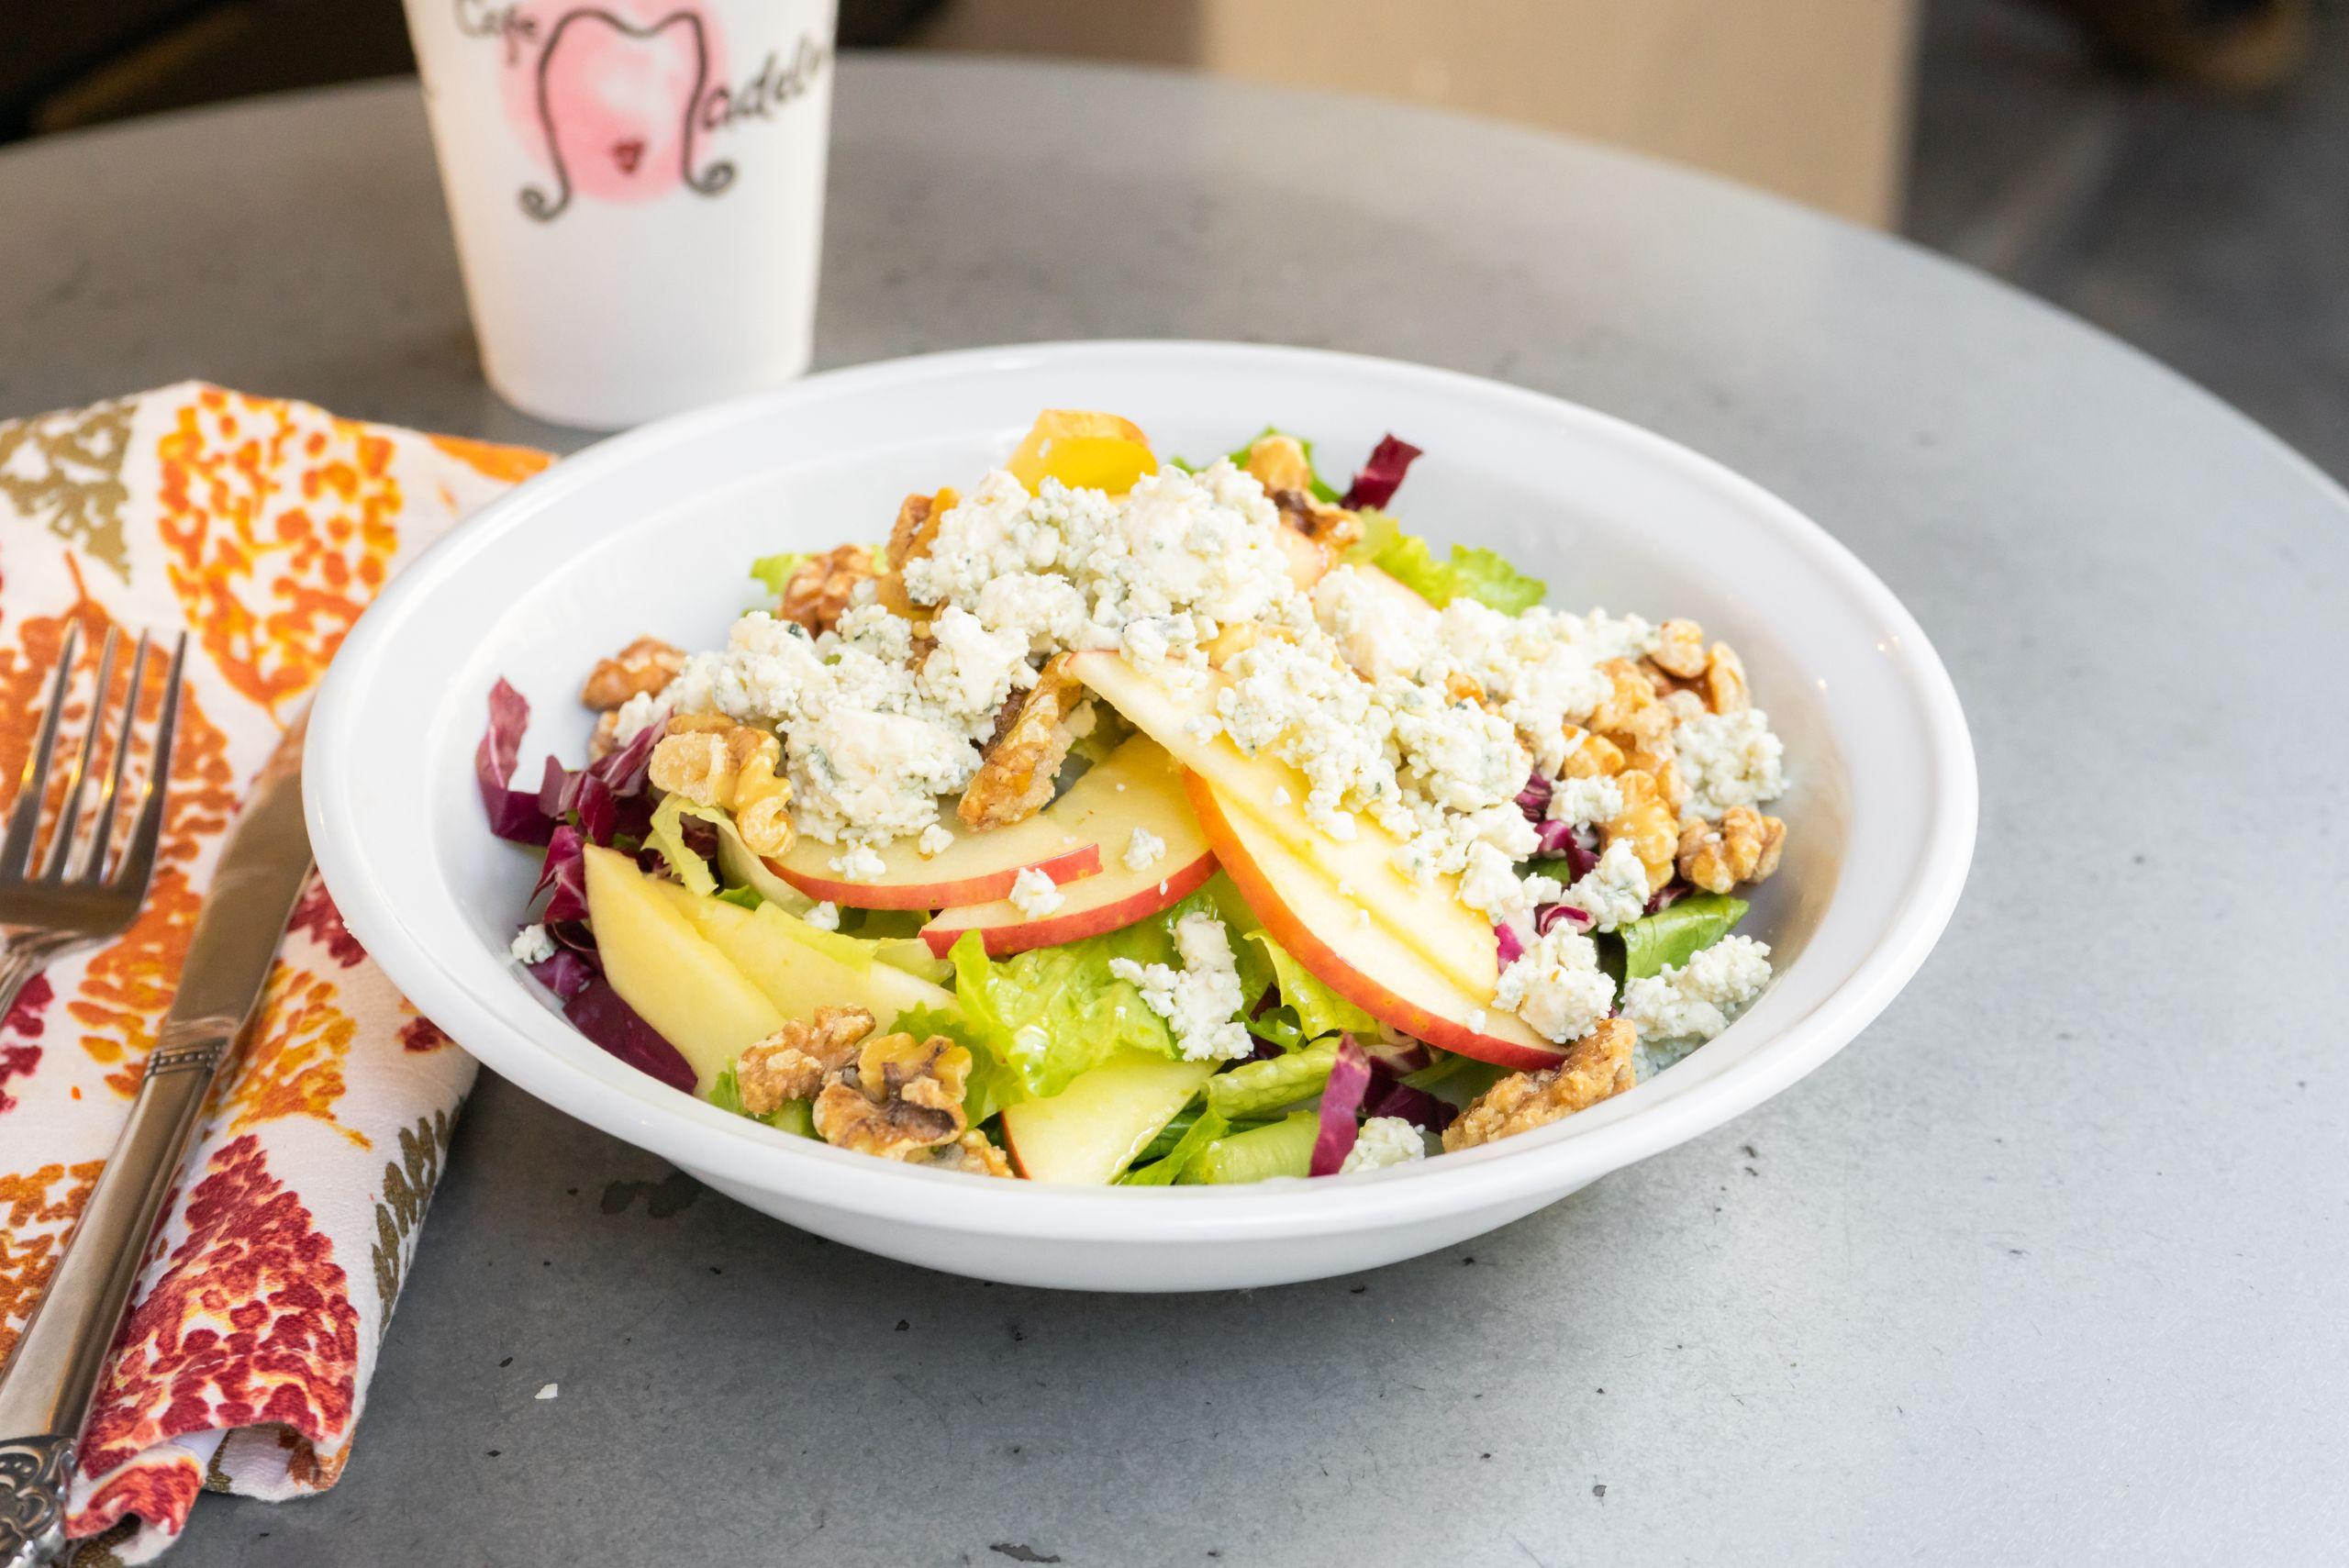 Cafe Madeleine Chopped Salad Online Order in San Francisco